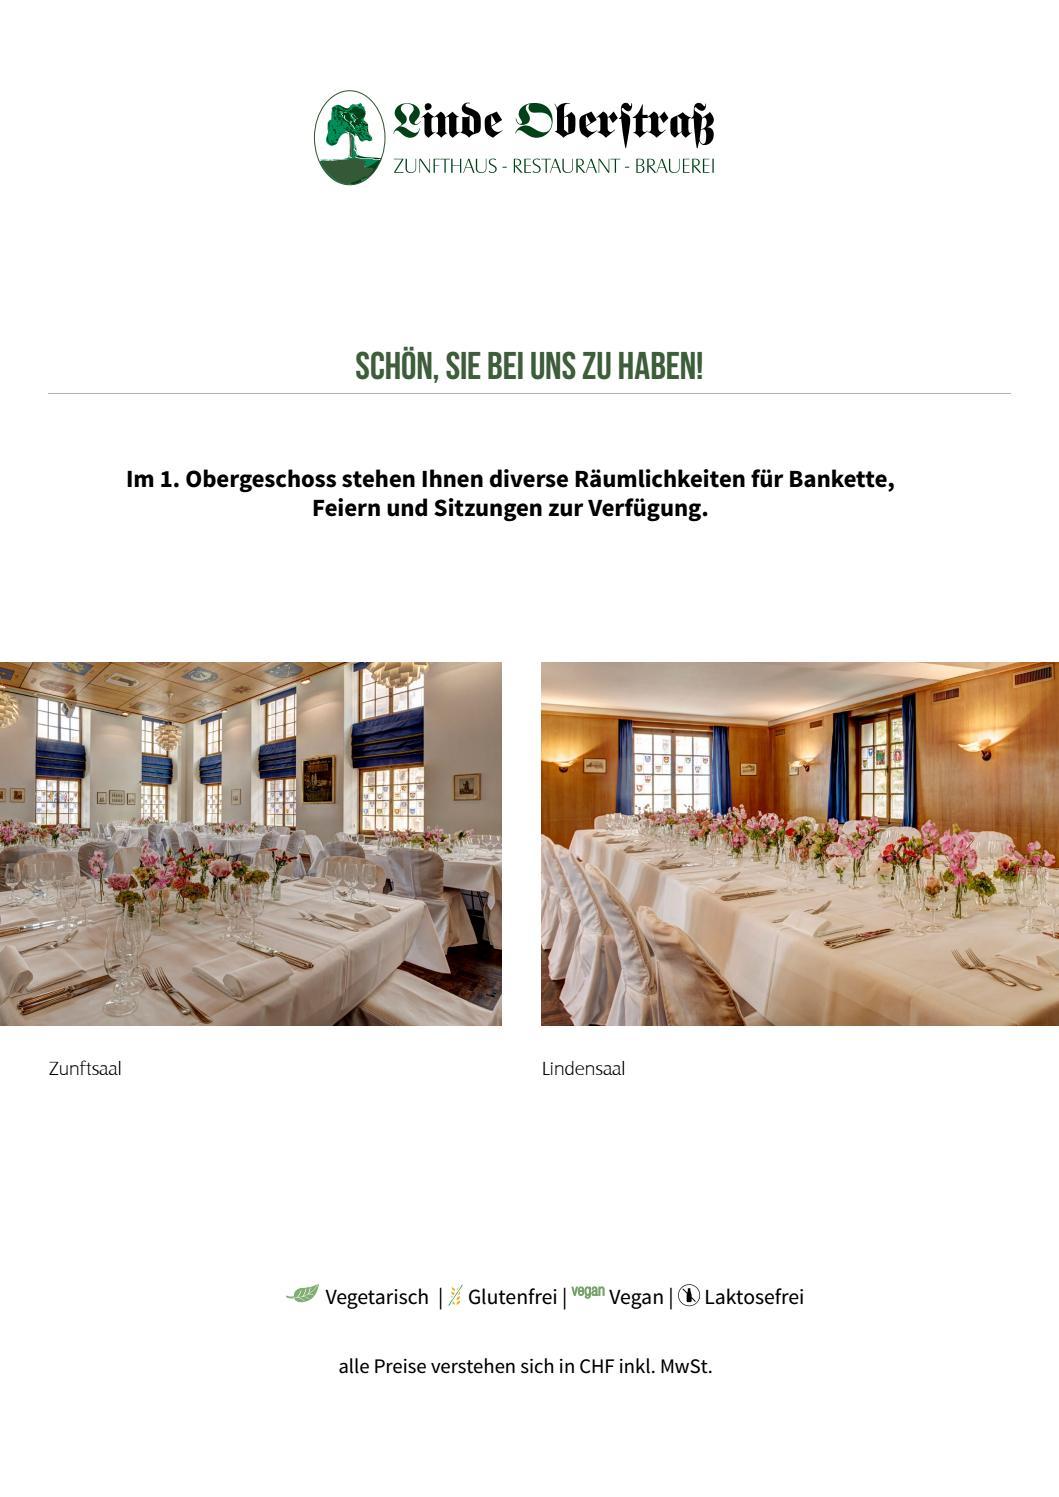 Carte Linde.A La Carte Linde Oberstrass By Remimag Gastronomie Ag Issuu